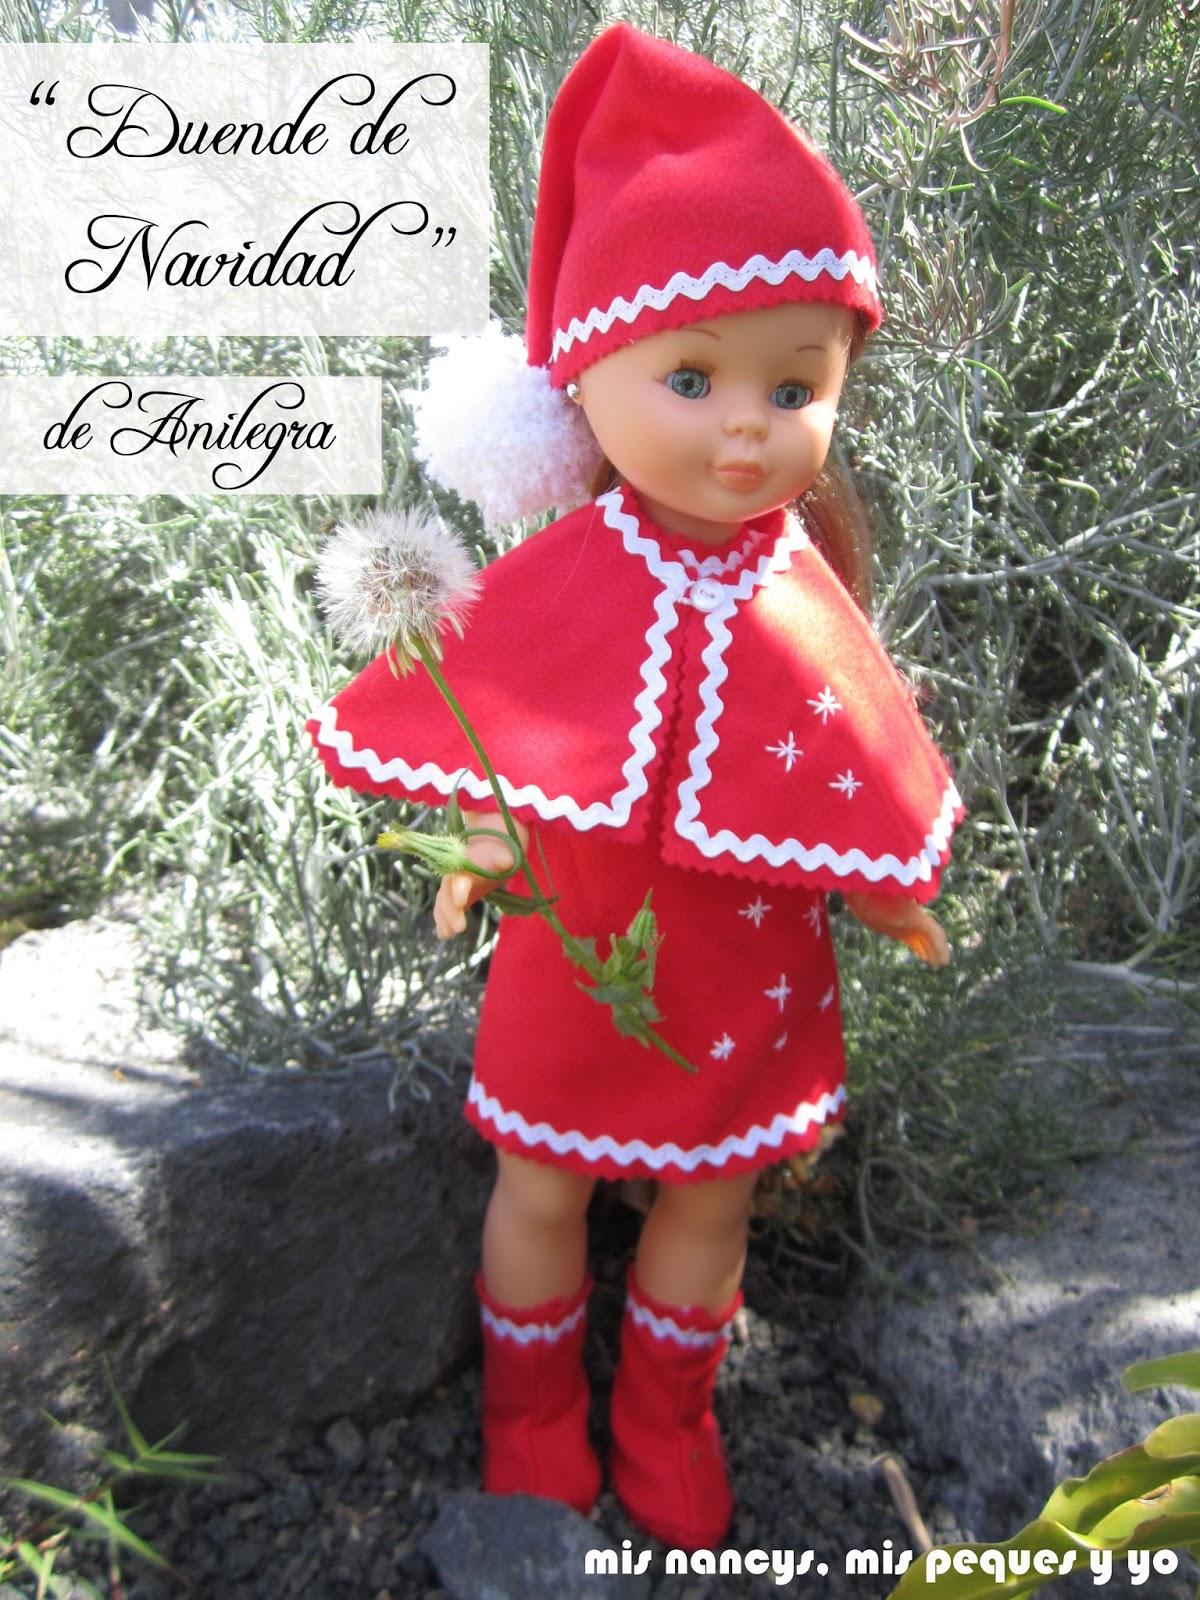 "Disfraz ""Duende de Navidad"" de Anilegra para Nancy"